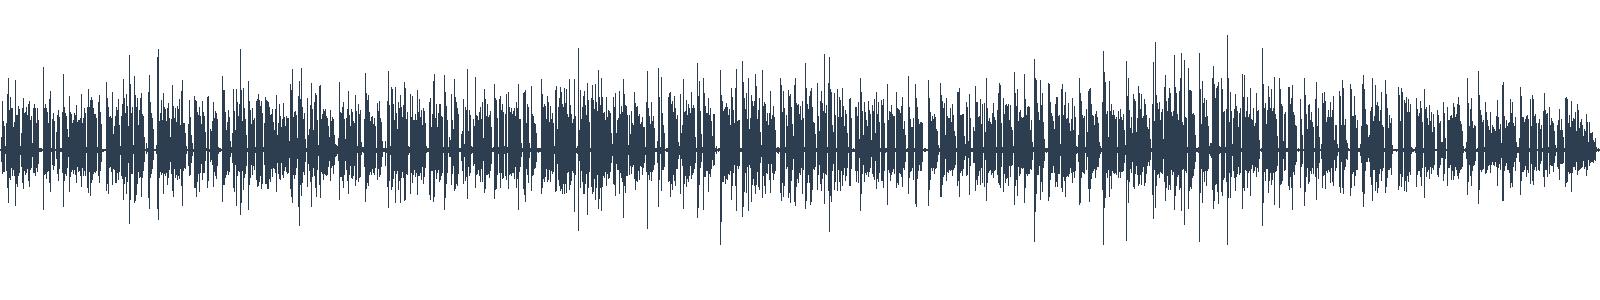 Sv. Klementa Hofbauera waveform